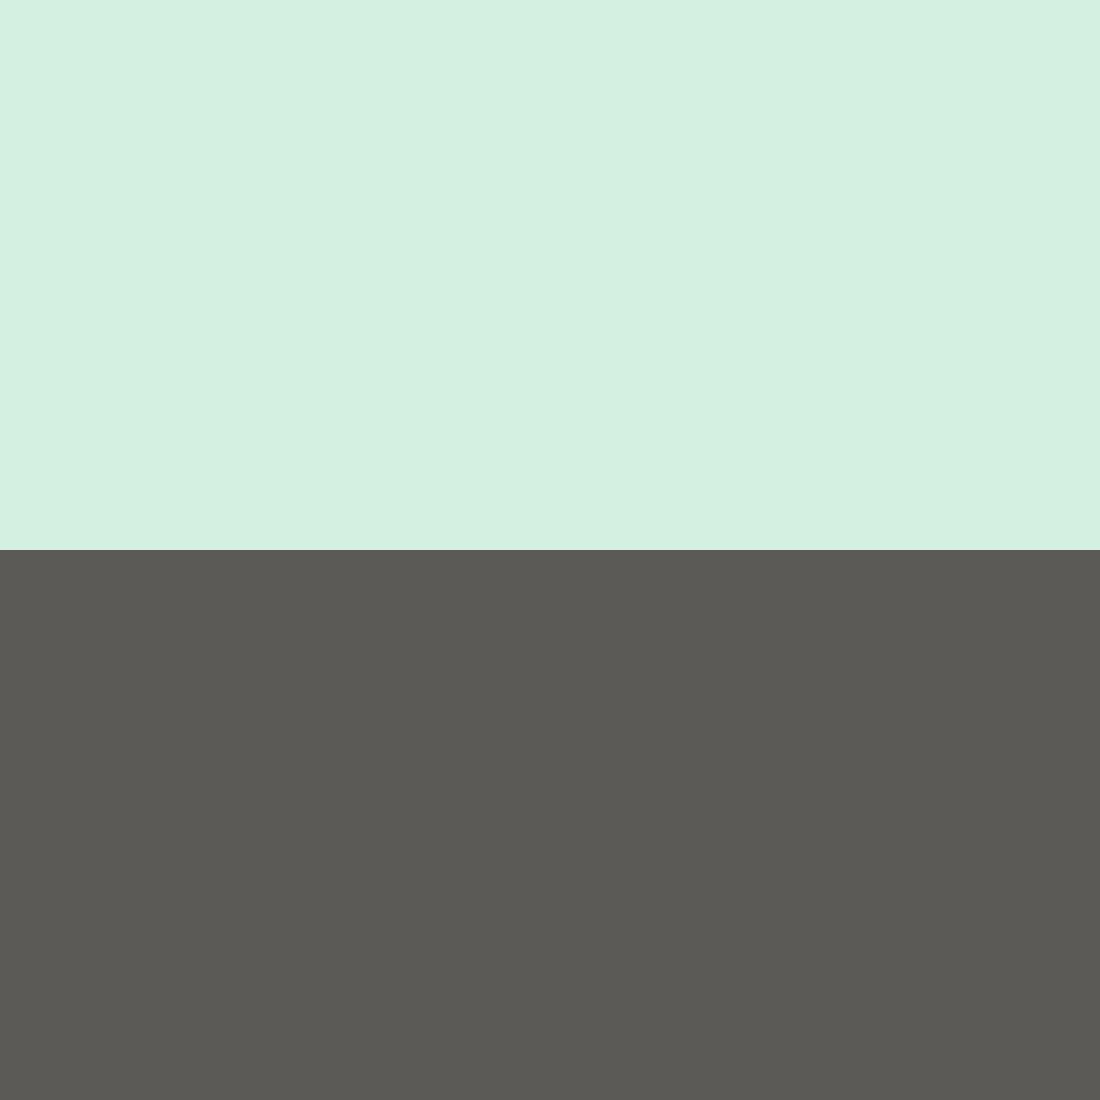 Splash Mint/Anthracite 4 x 2100 x 750mm